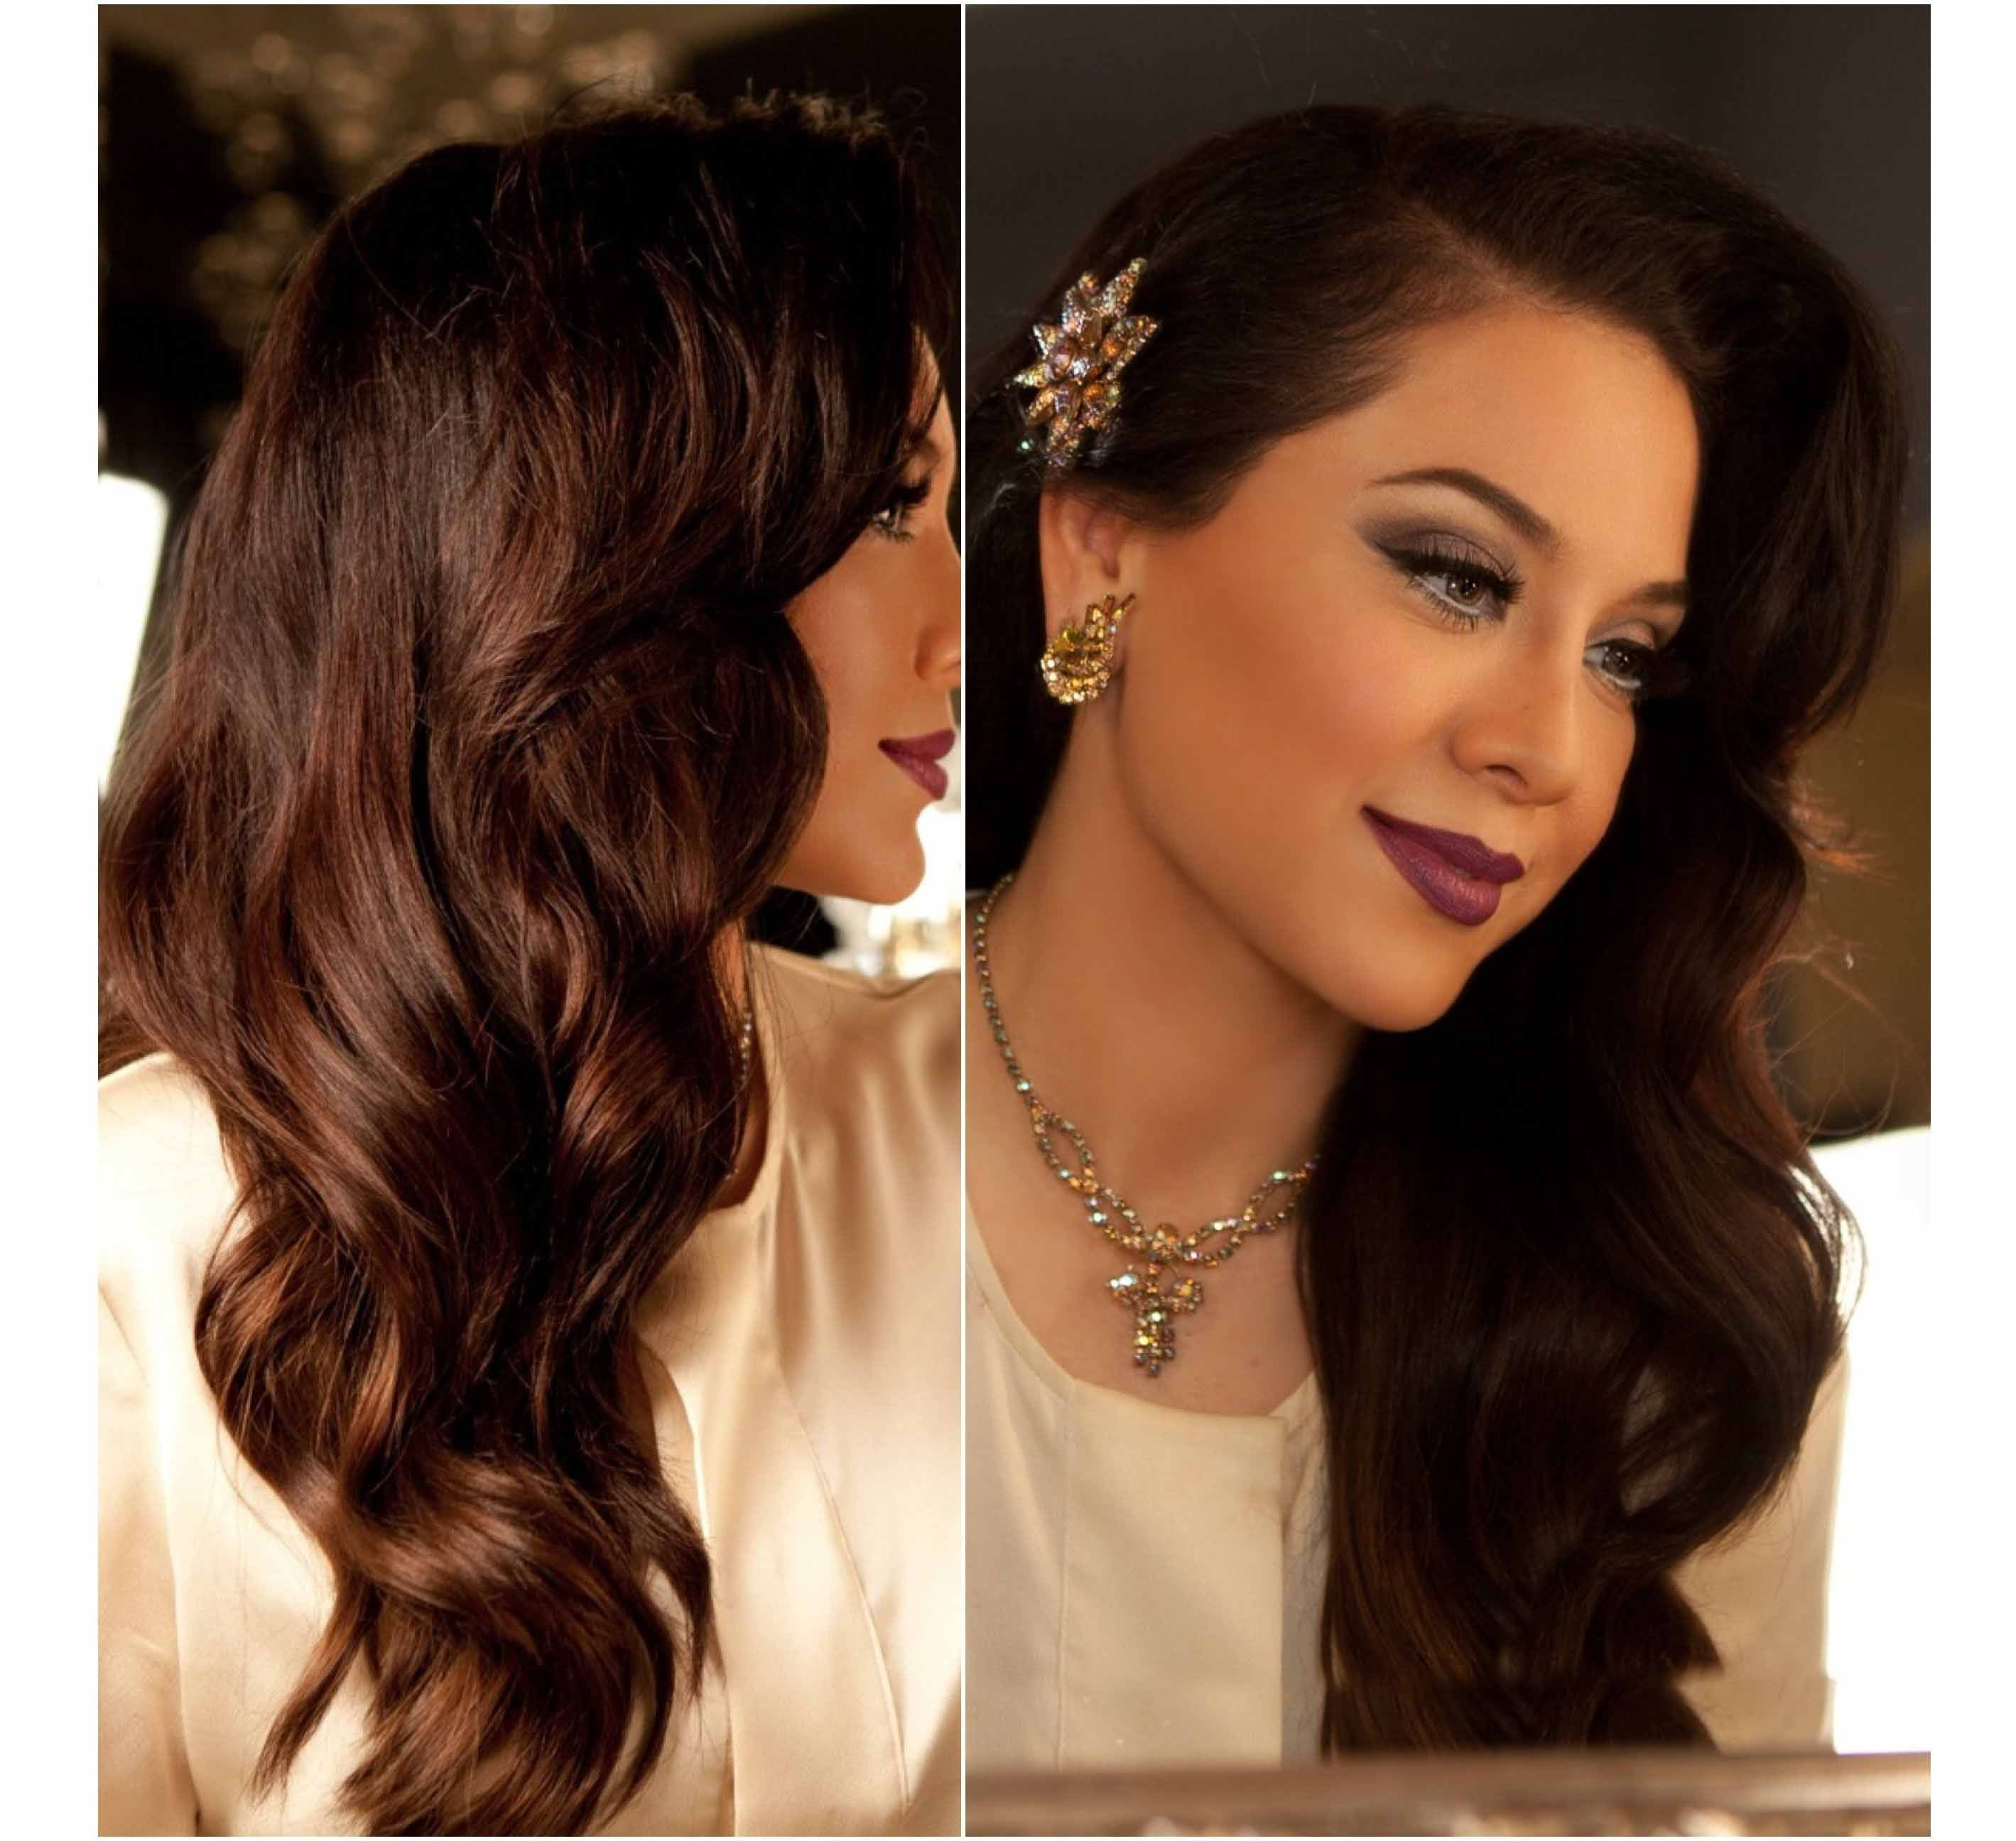 1920s Hairstyles For Long Hair Finger Waves Jpg 2838 2592 Vintage Hairstyles For Long Hair 1920s Long Hair Wedding Hairstyles For Long Hair